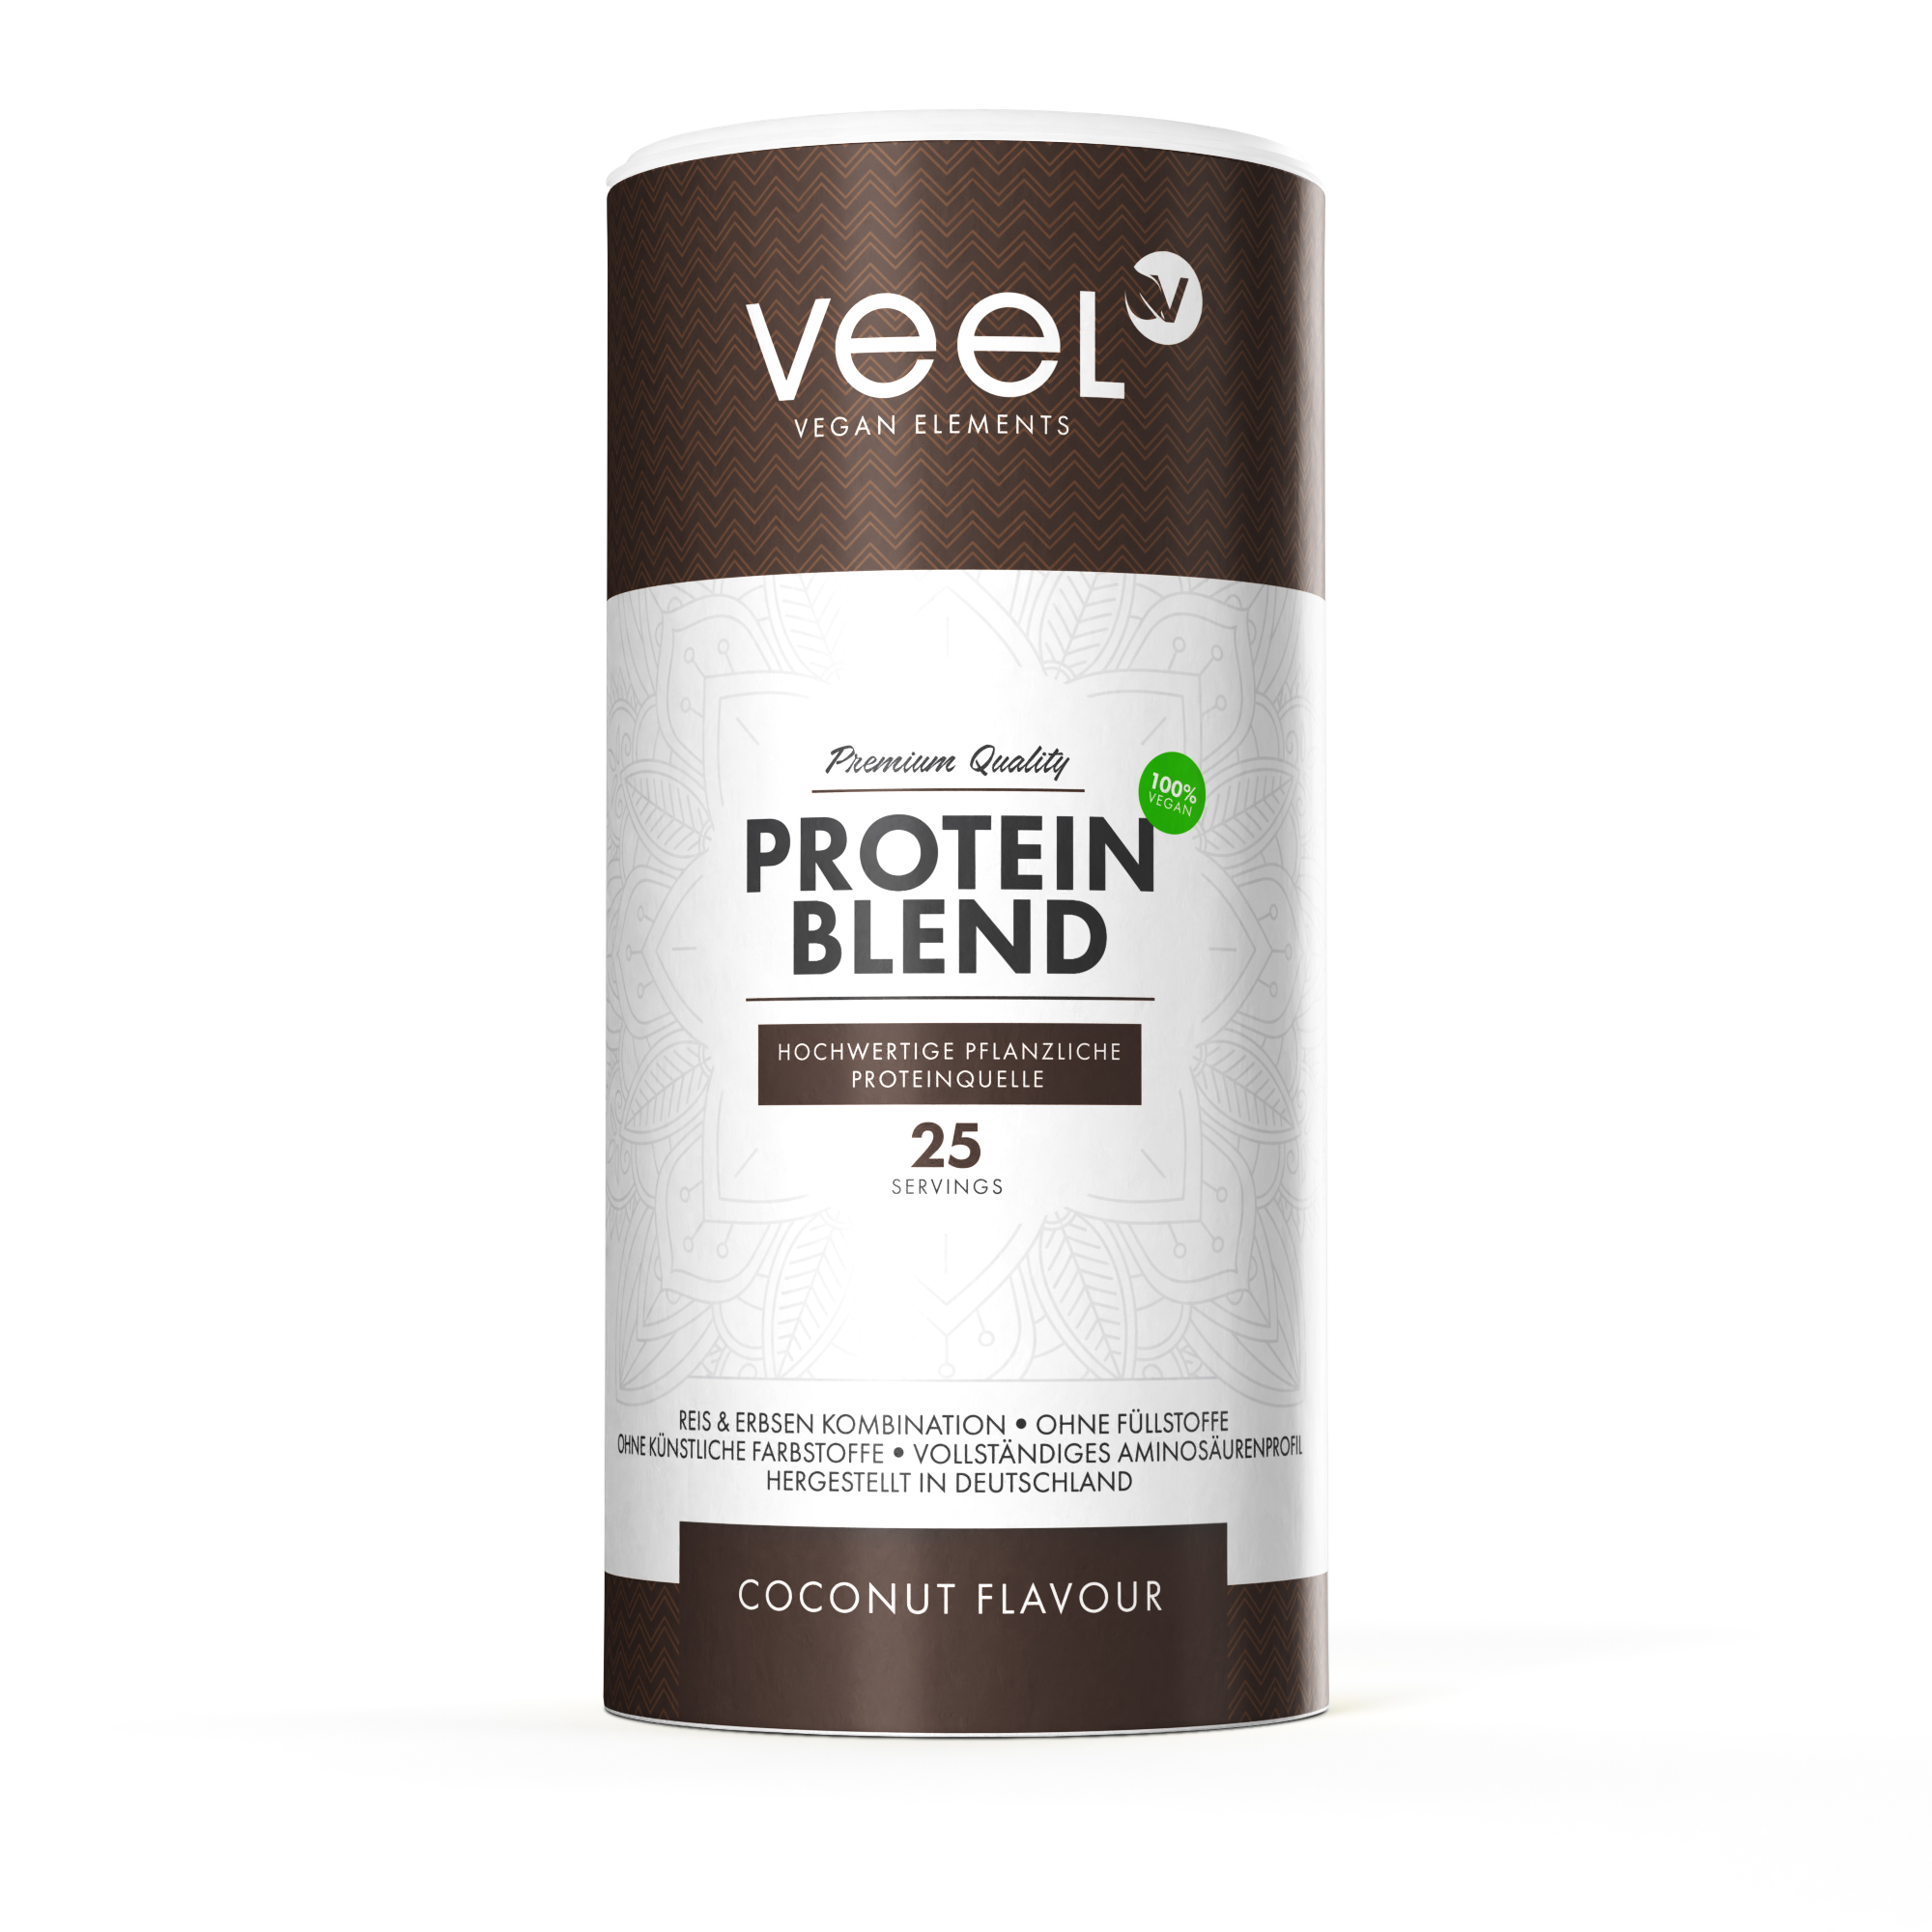 VEEL Protein Blend 750g/Vanilla